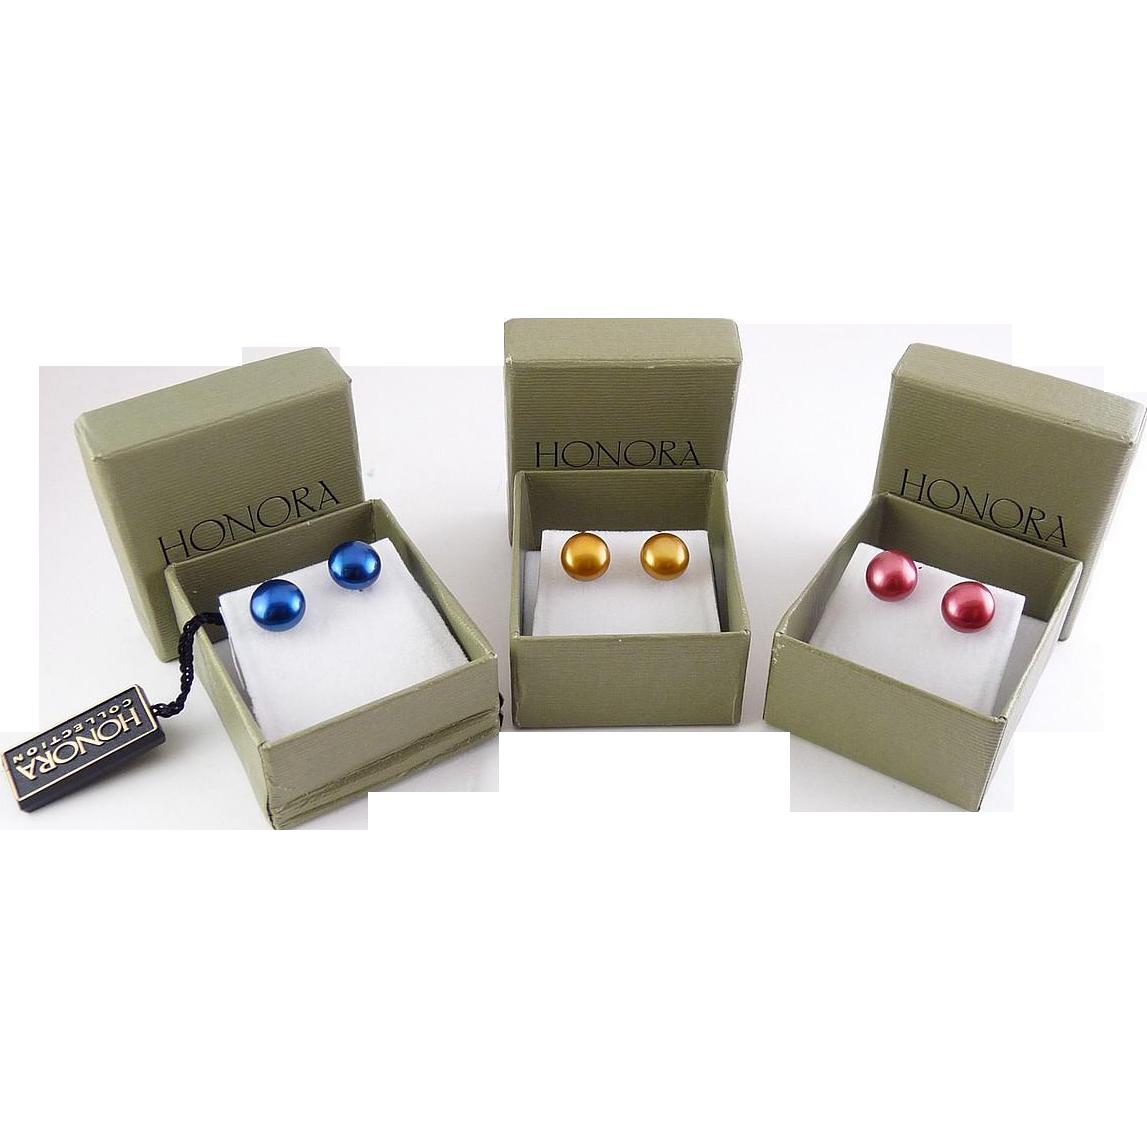 3 Pair HONORA Pearl & Sterling Stud Earrings - Blue, Yellow Gold, Red